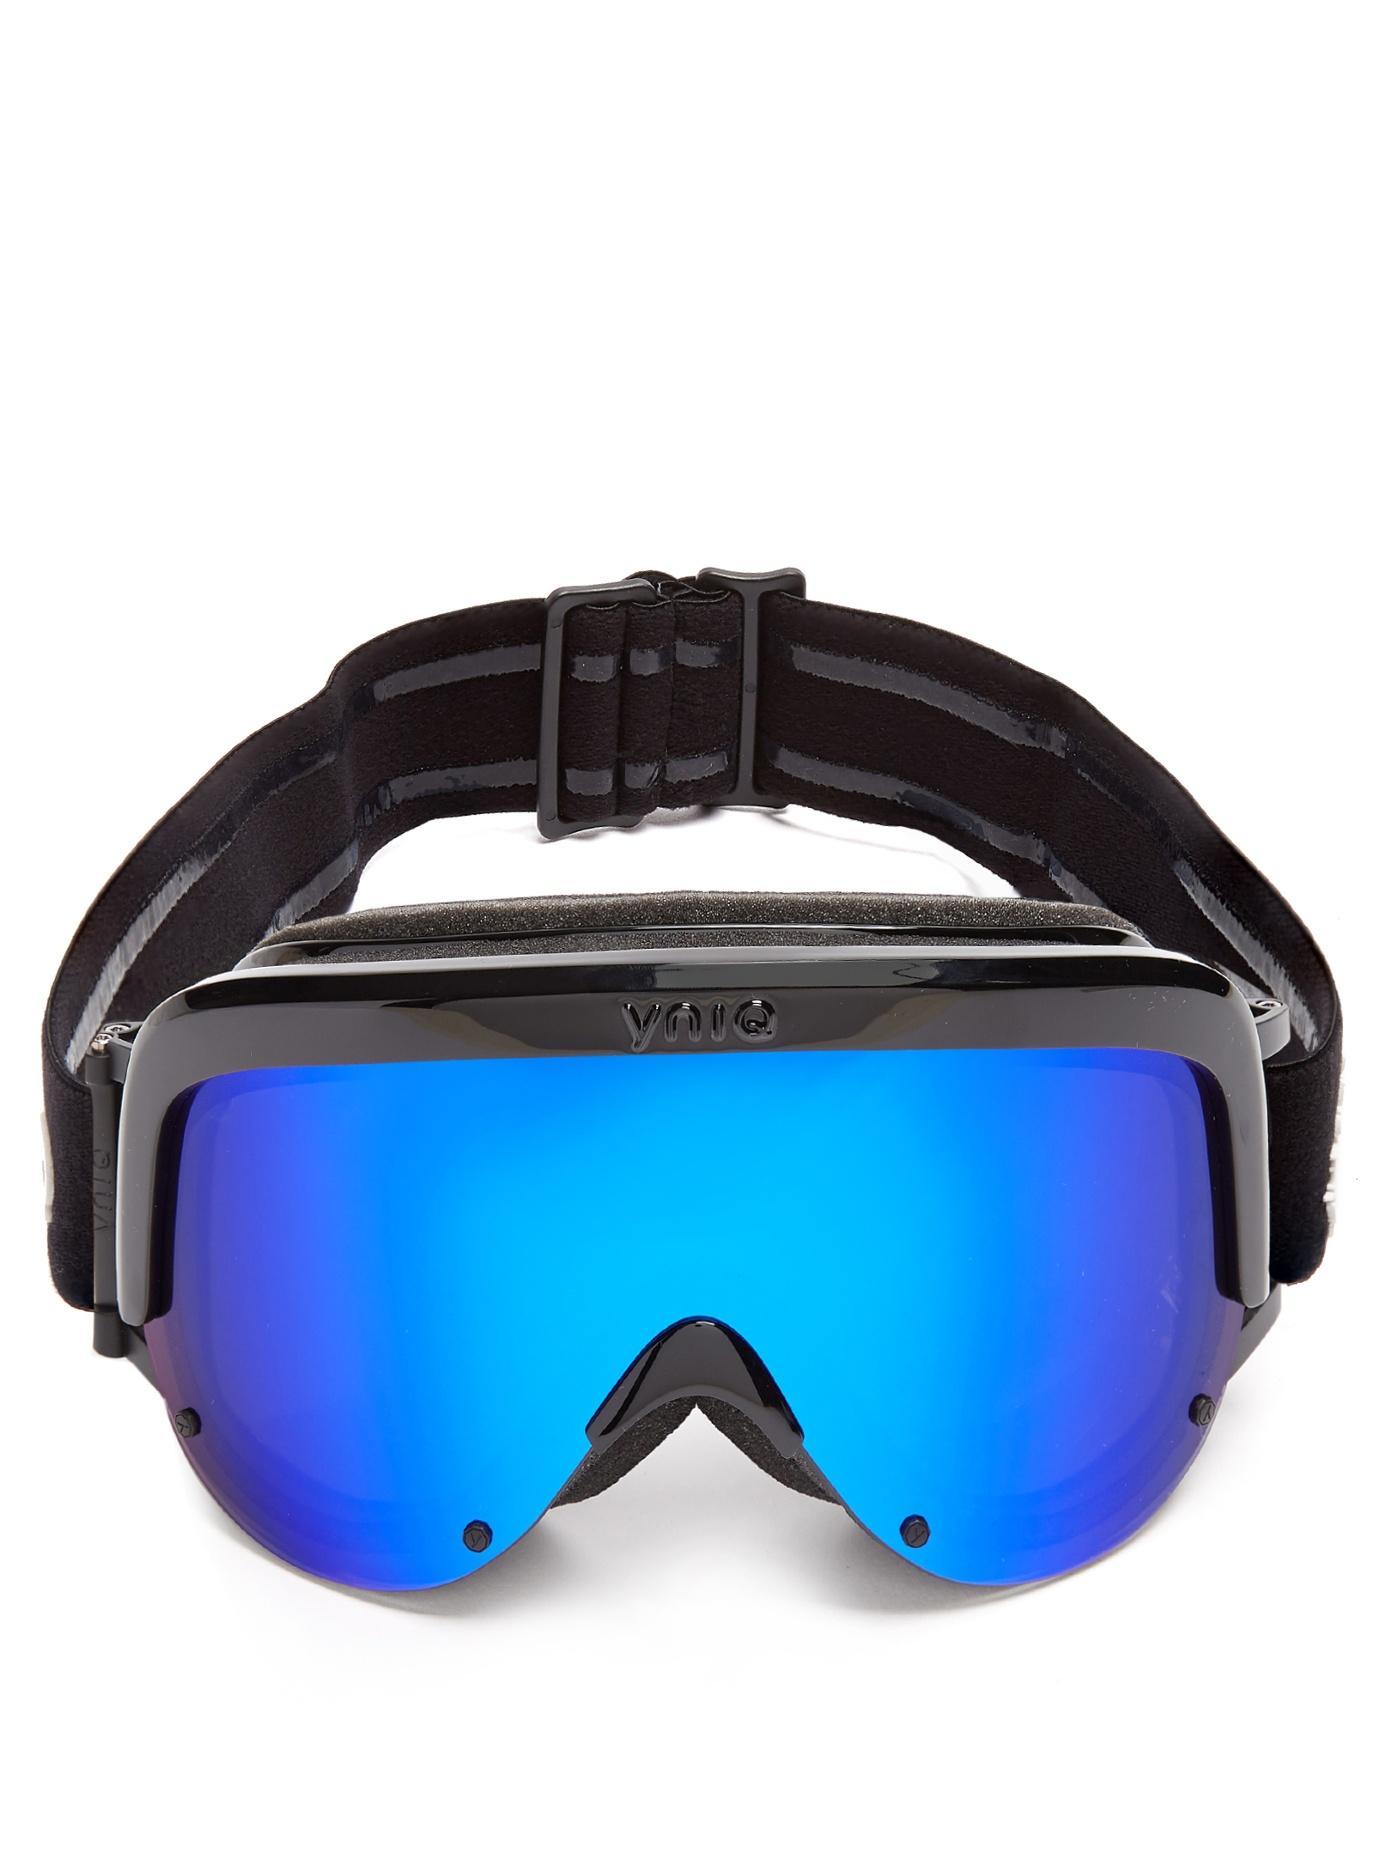 Yniq Model One Extended-Vision Ski Goggles In Black Multi